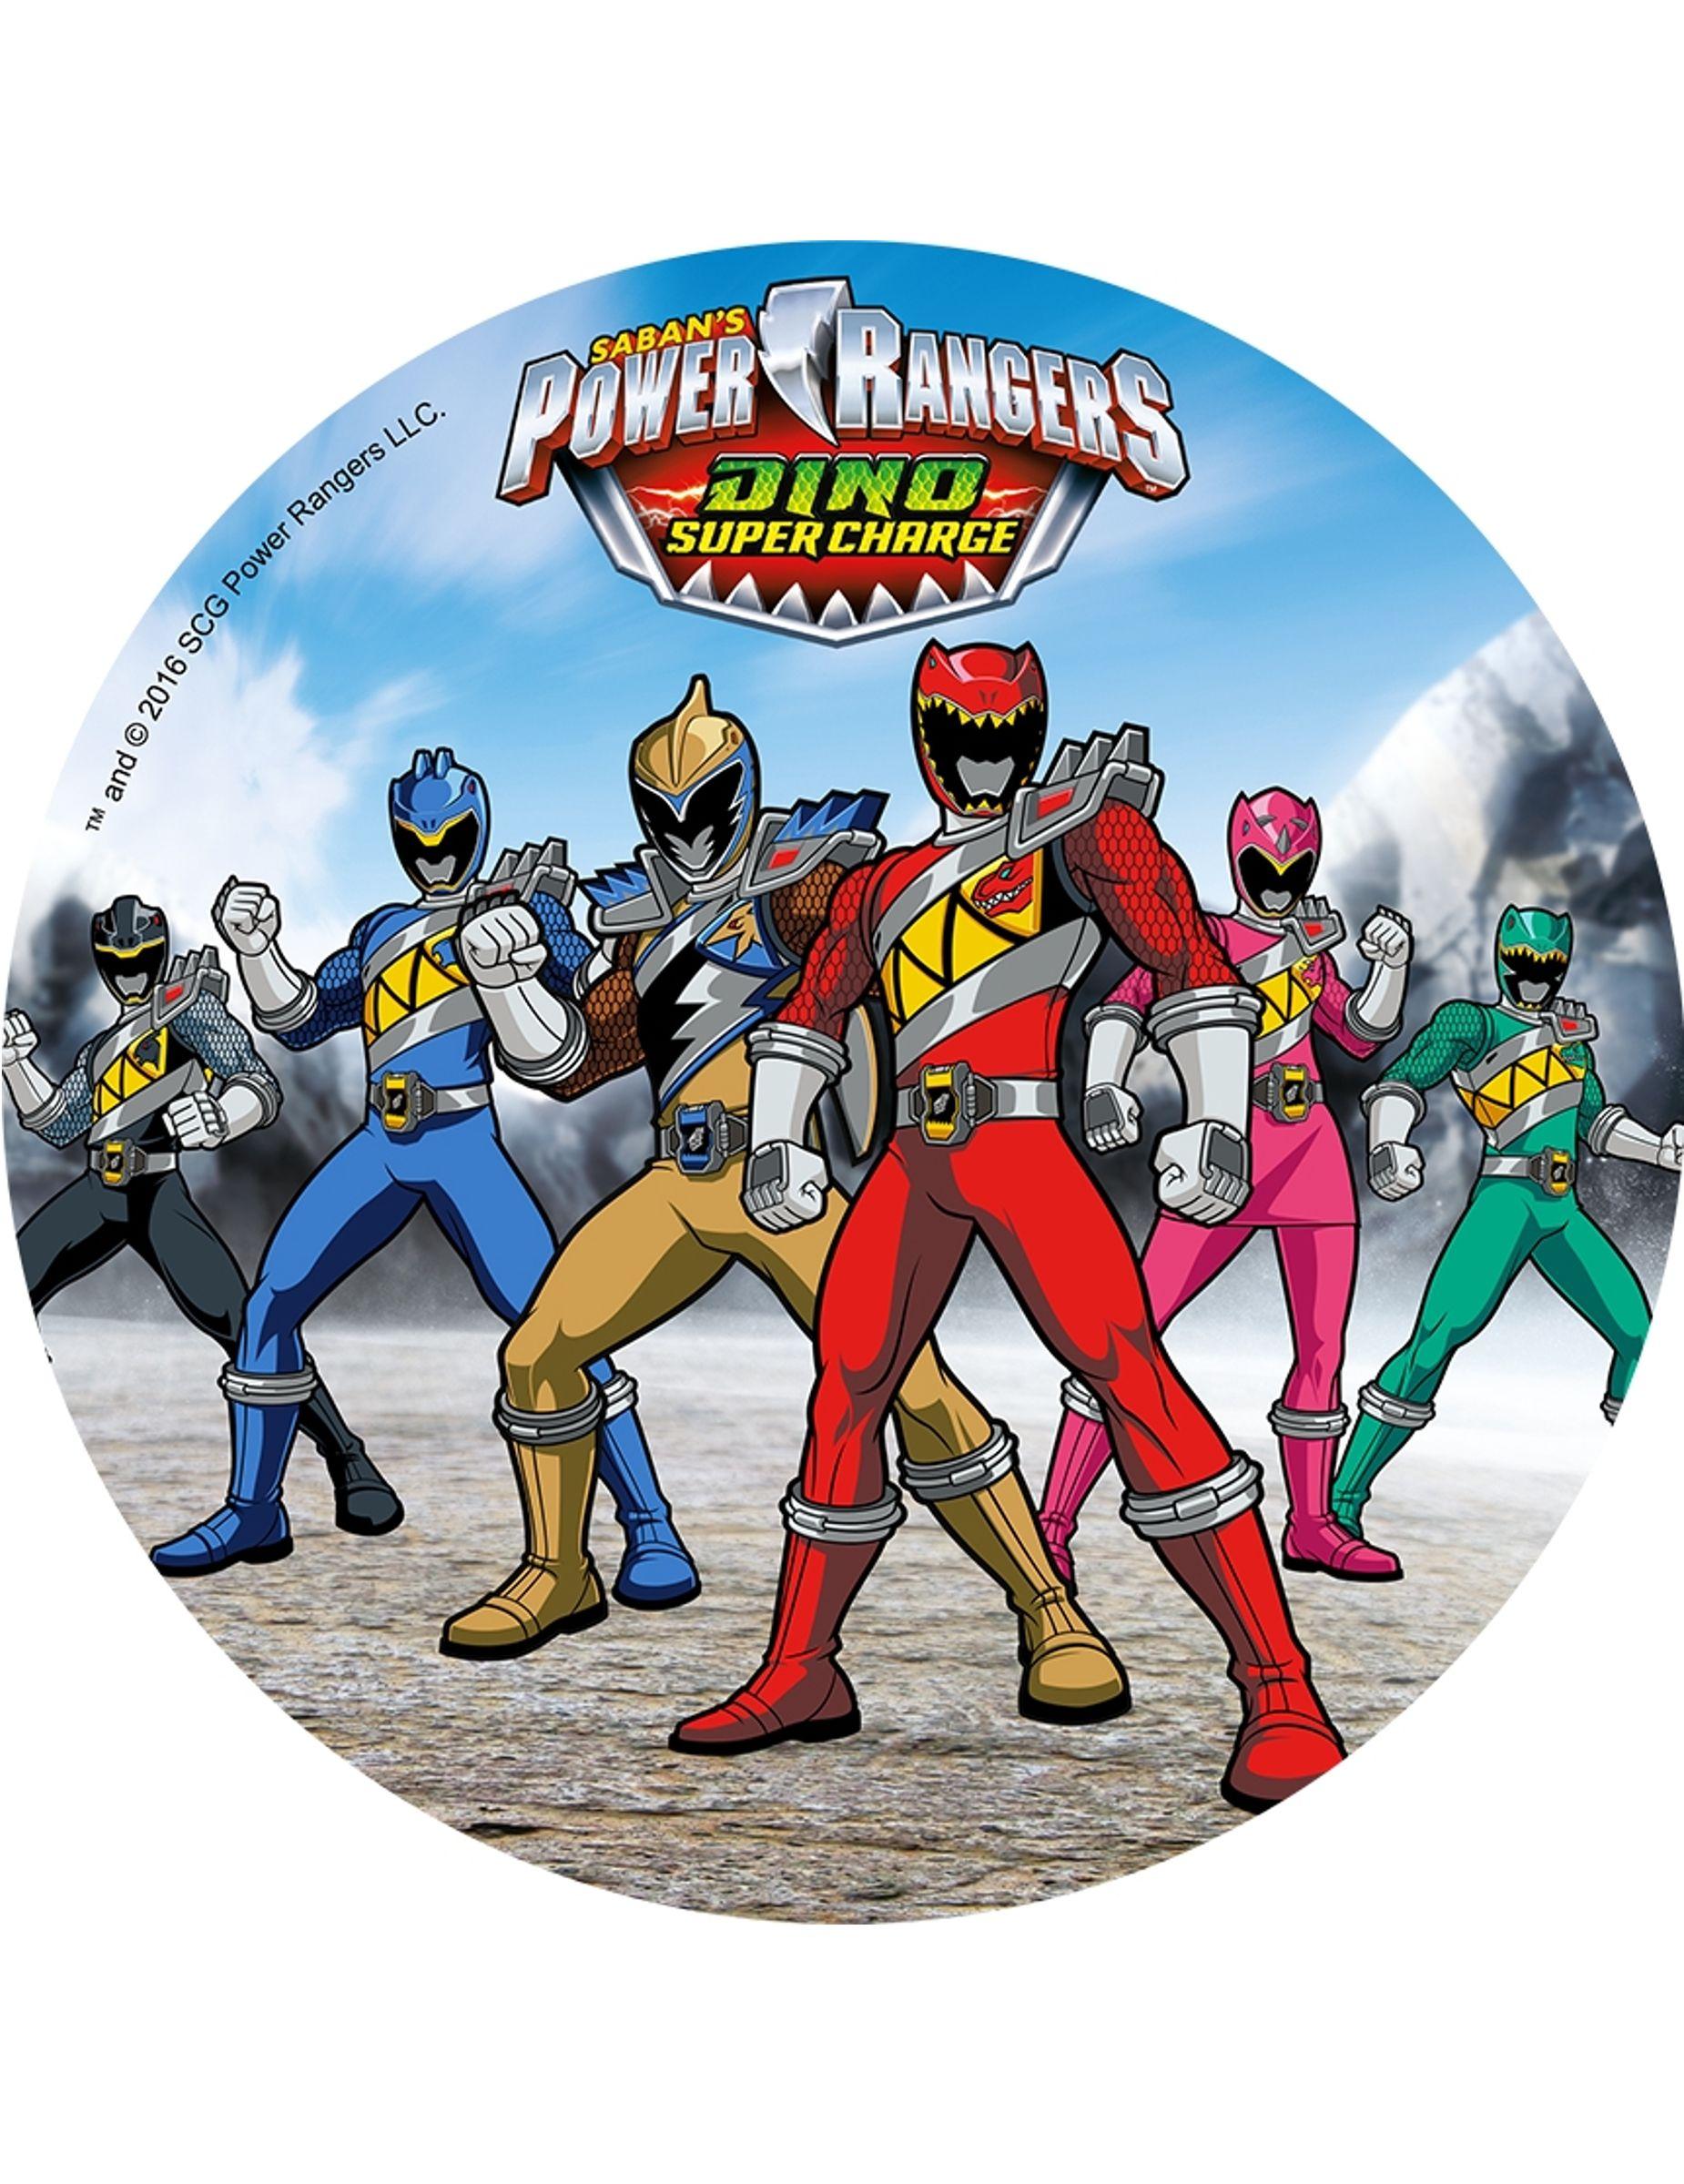 Geschmackvoller Power Rangers Tortenaufleger Lizenzartikel Bunt 21cm Gunstige Faschings Partydeko Zubehor Bei Karneval Megastore Power Ranger Party Power Rangers Ranger